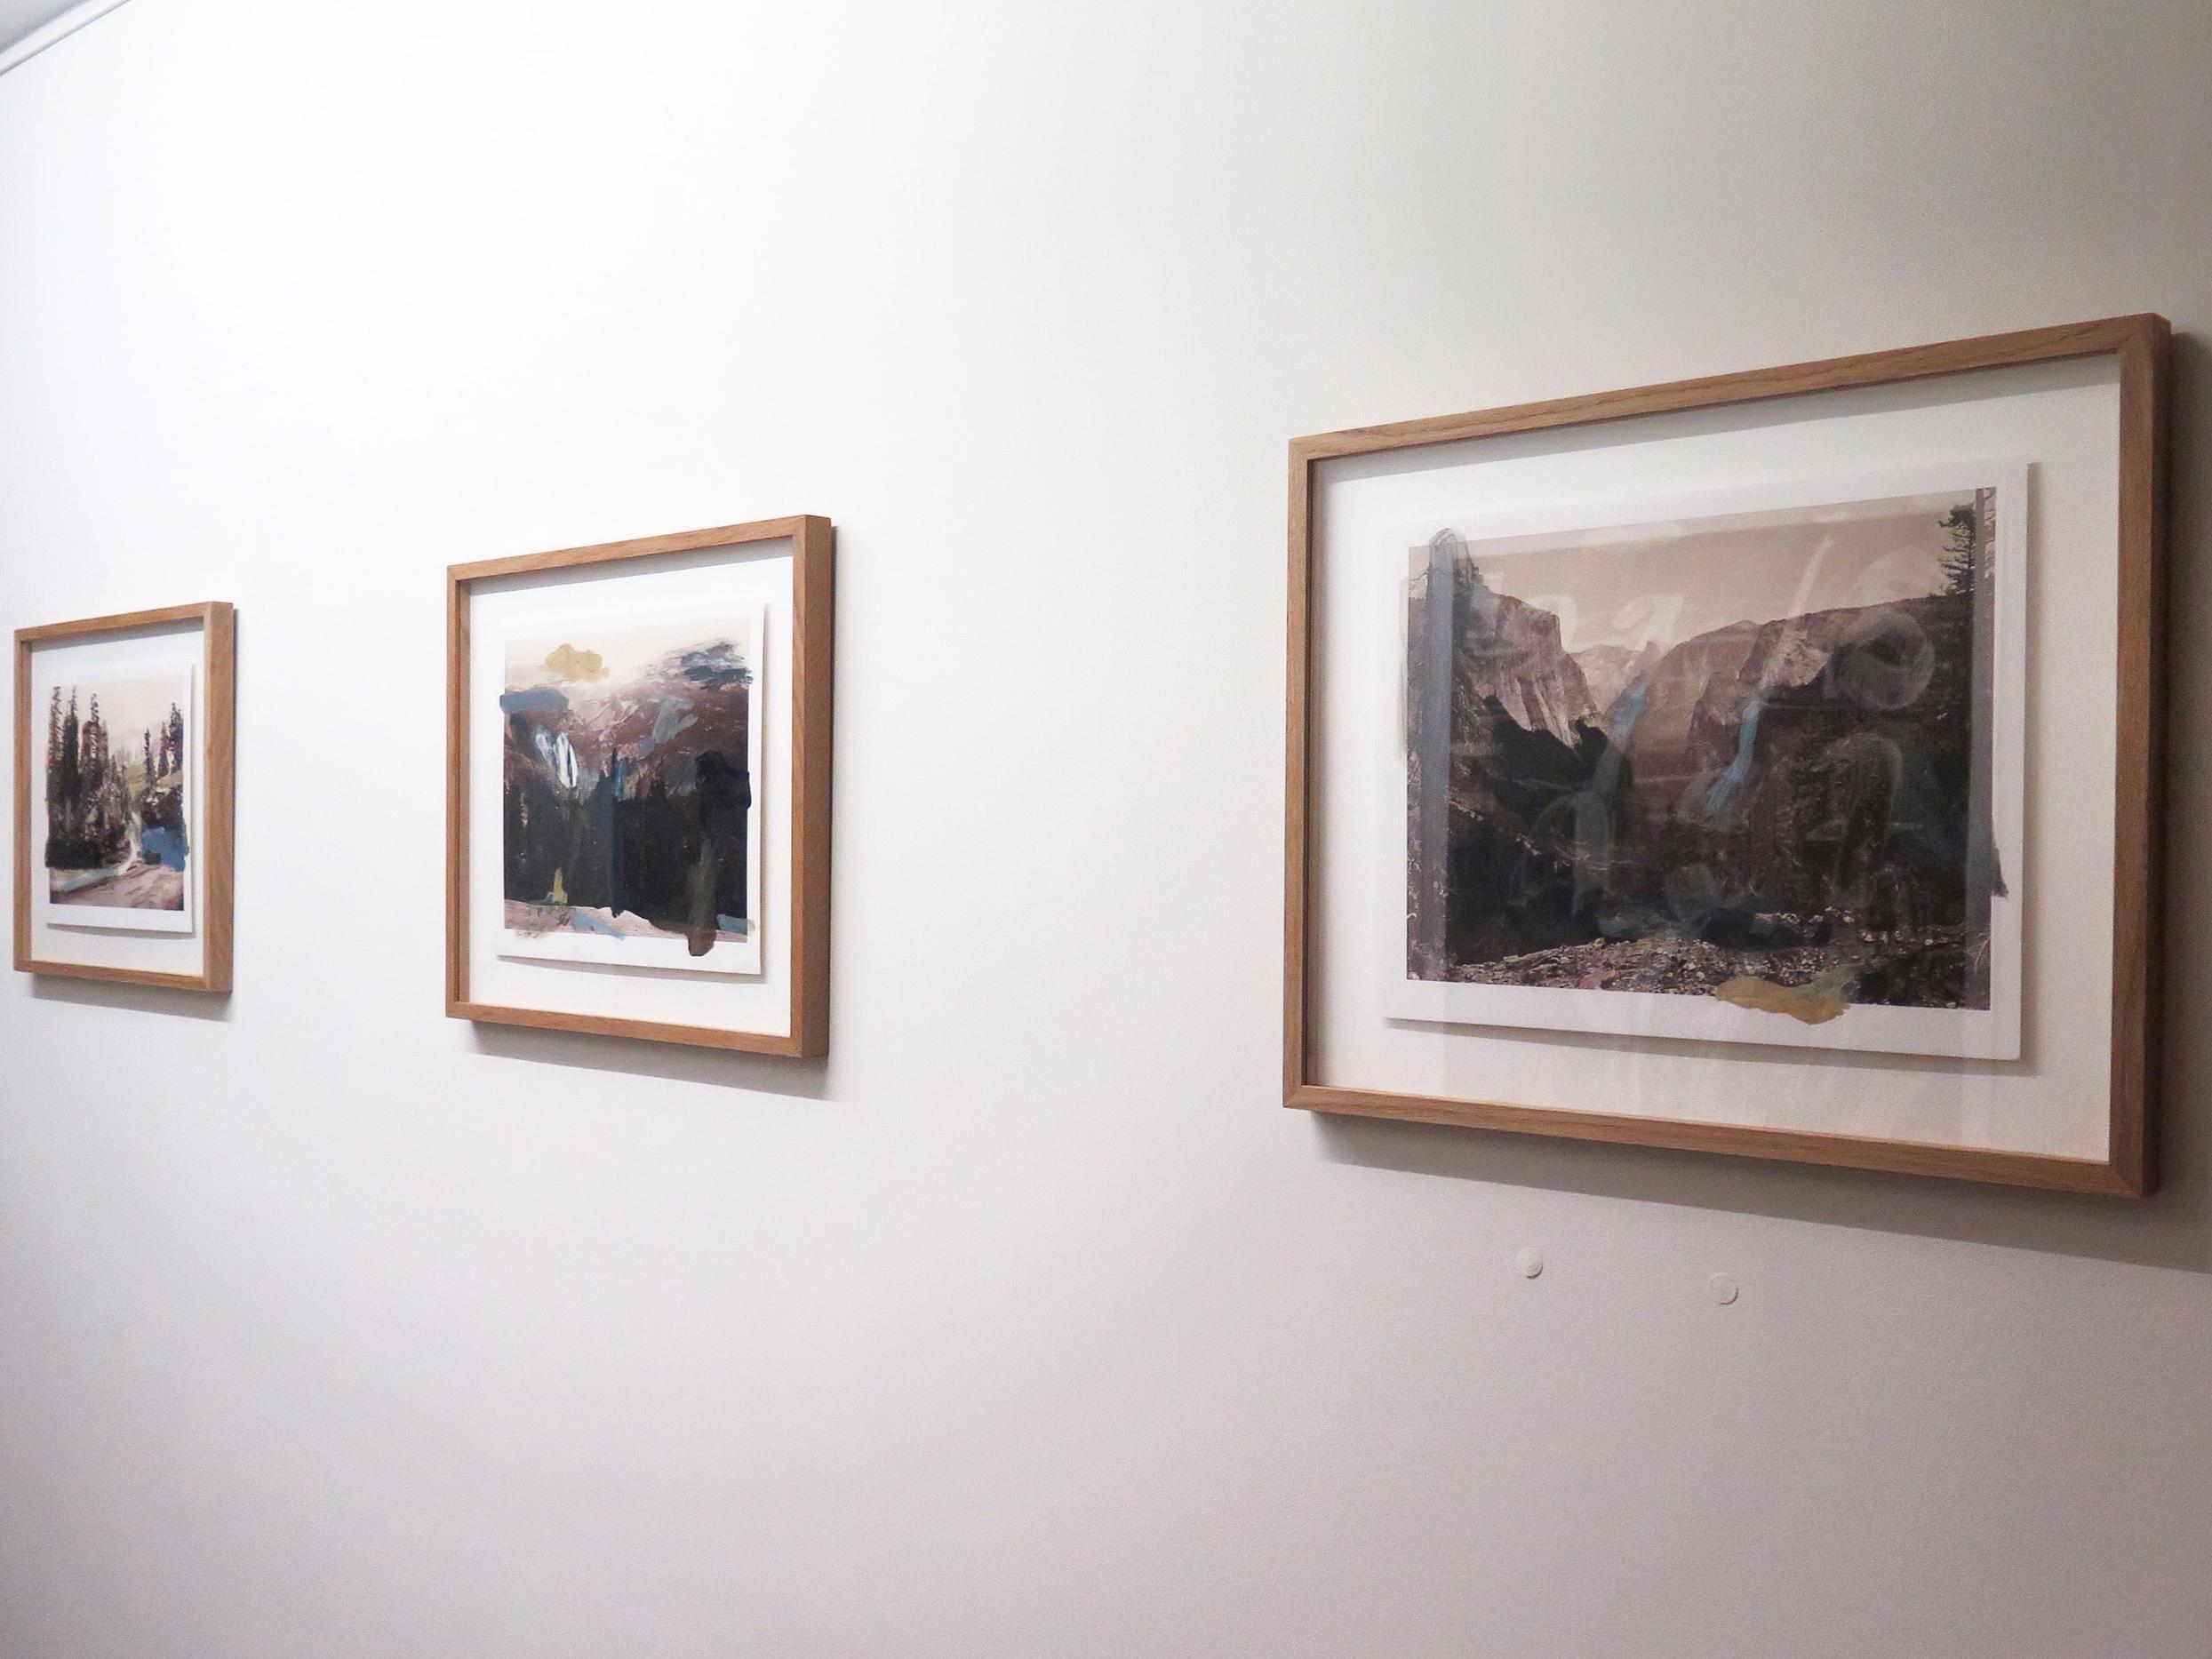 Over Watkins , 2015 oil on c-prints,  after Carleton Watkins  each  print: 28 x 35 cm ;frame: 46,5 x 39 x 2,5 cm